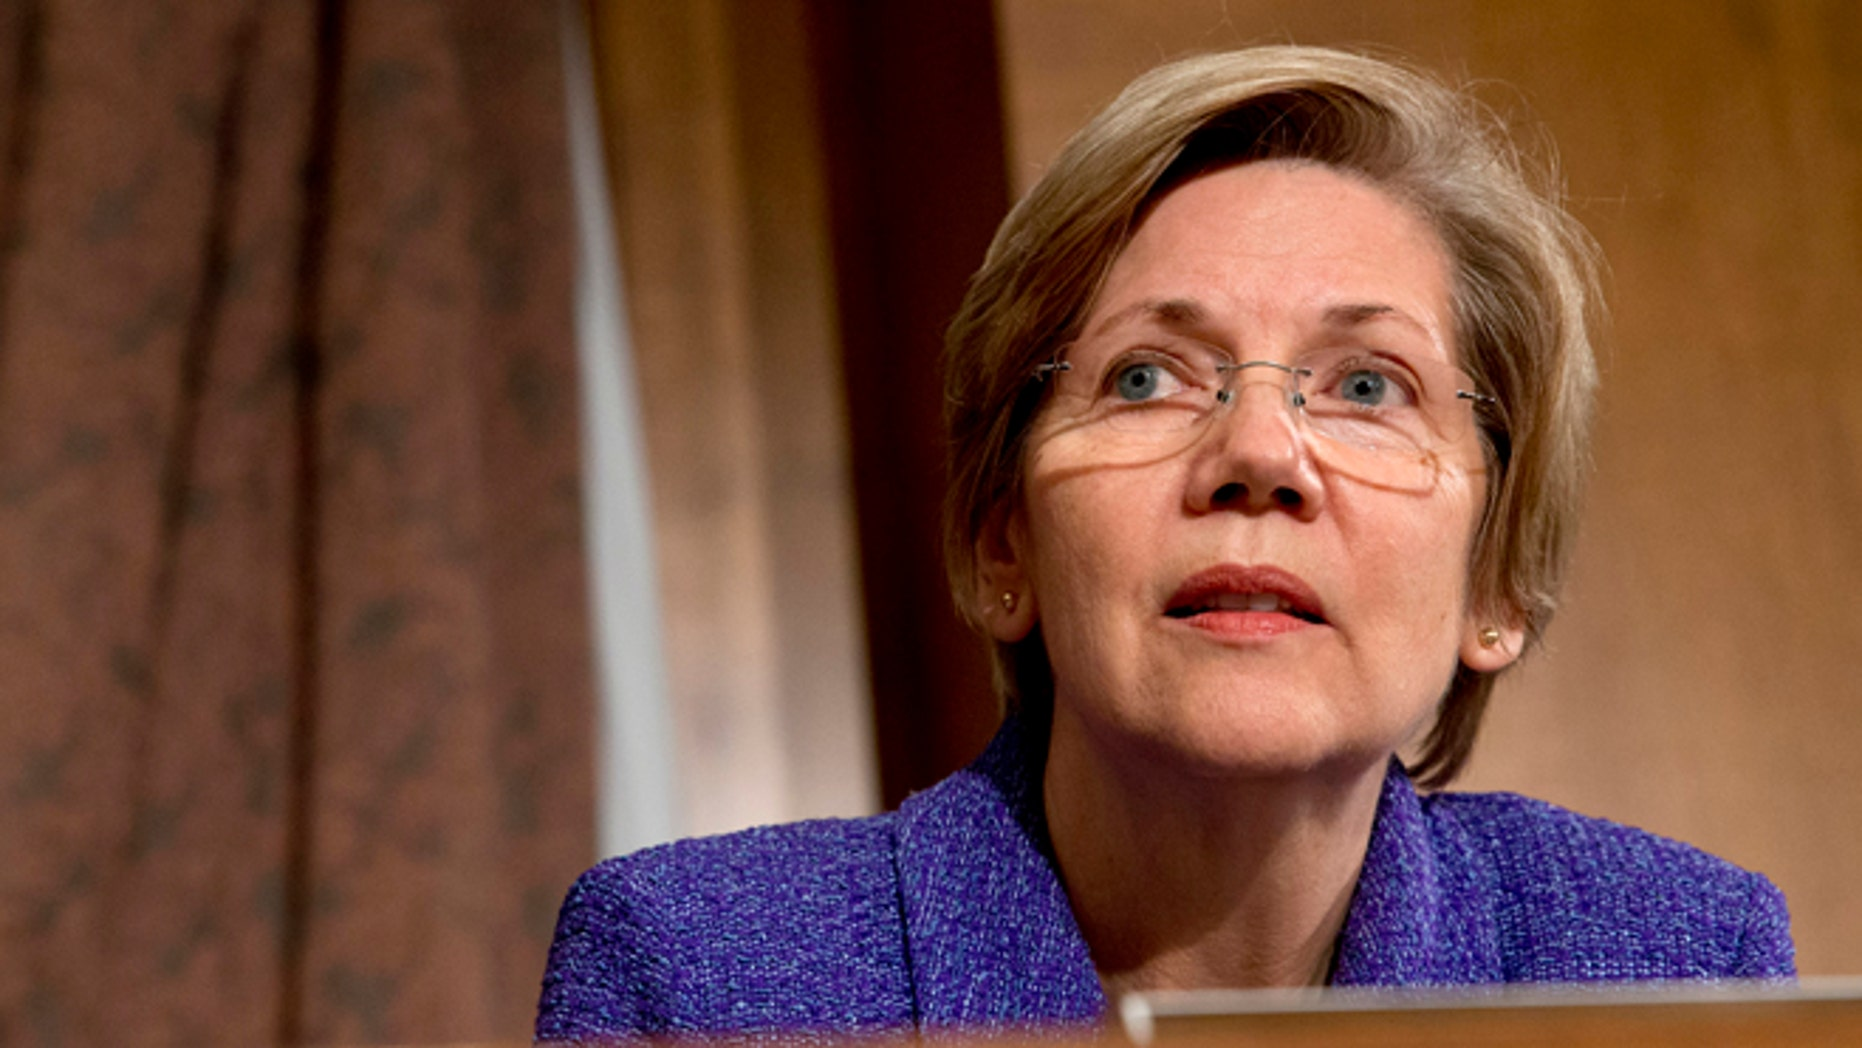 FILE: Tuesday Nov. 12, 2013: Senate Banking Committee member Sen. Elizabeth Warren, D- Mass. listens to testimony on Capitol Hill, in Washington, D.C.